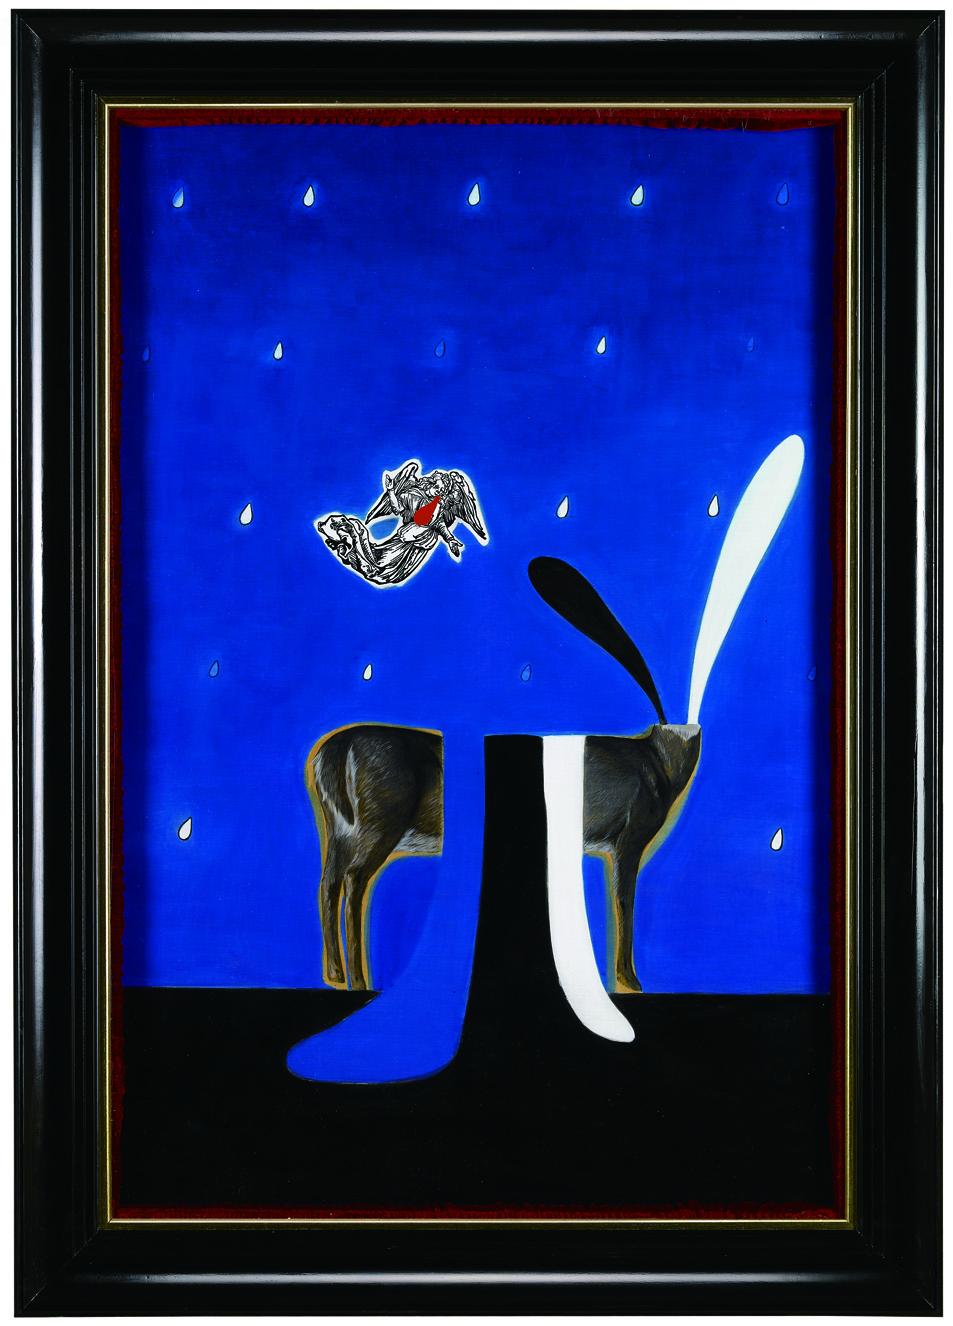 Wu Di 吴笛, Goodbye 再见, 2011, Mix media on board 木板综合材料, 90 x 60 cm